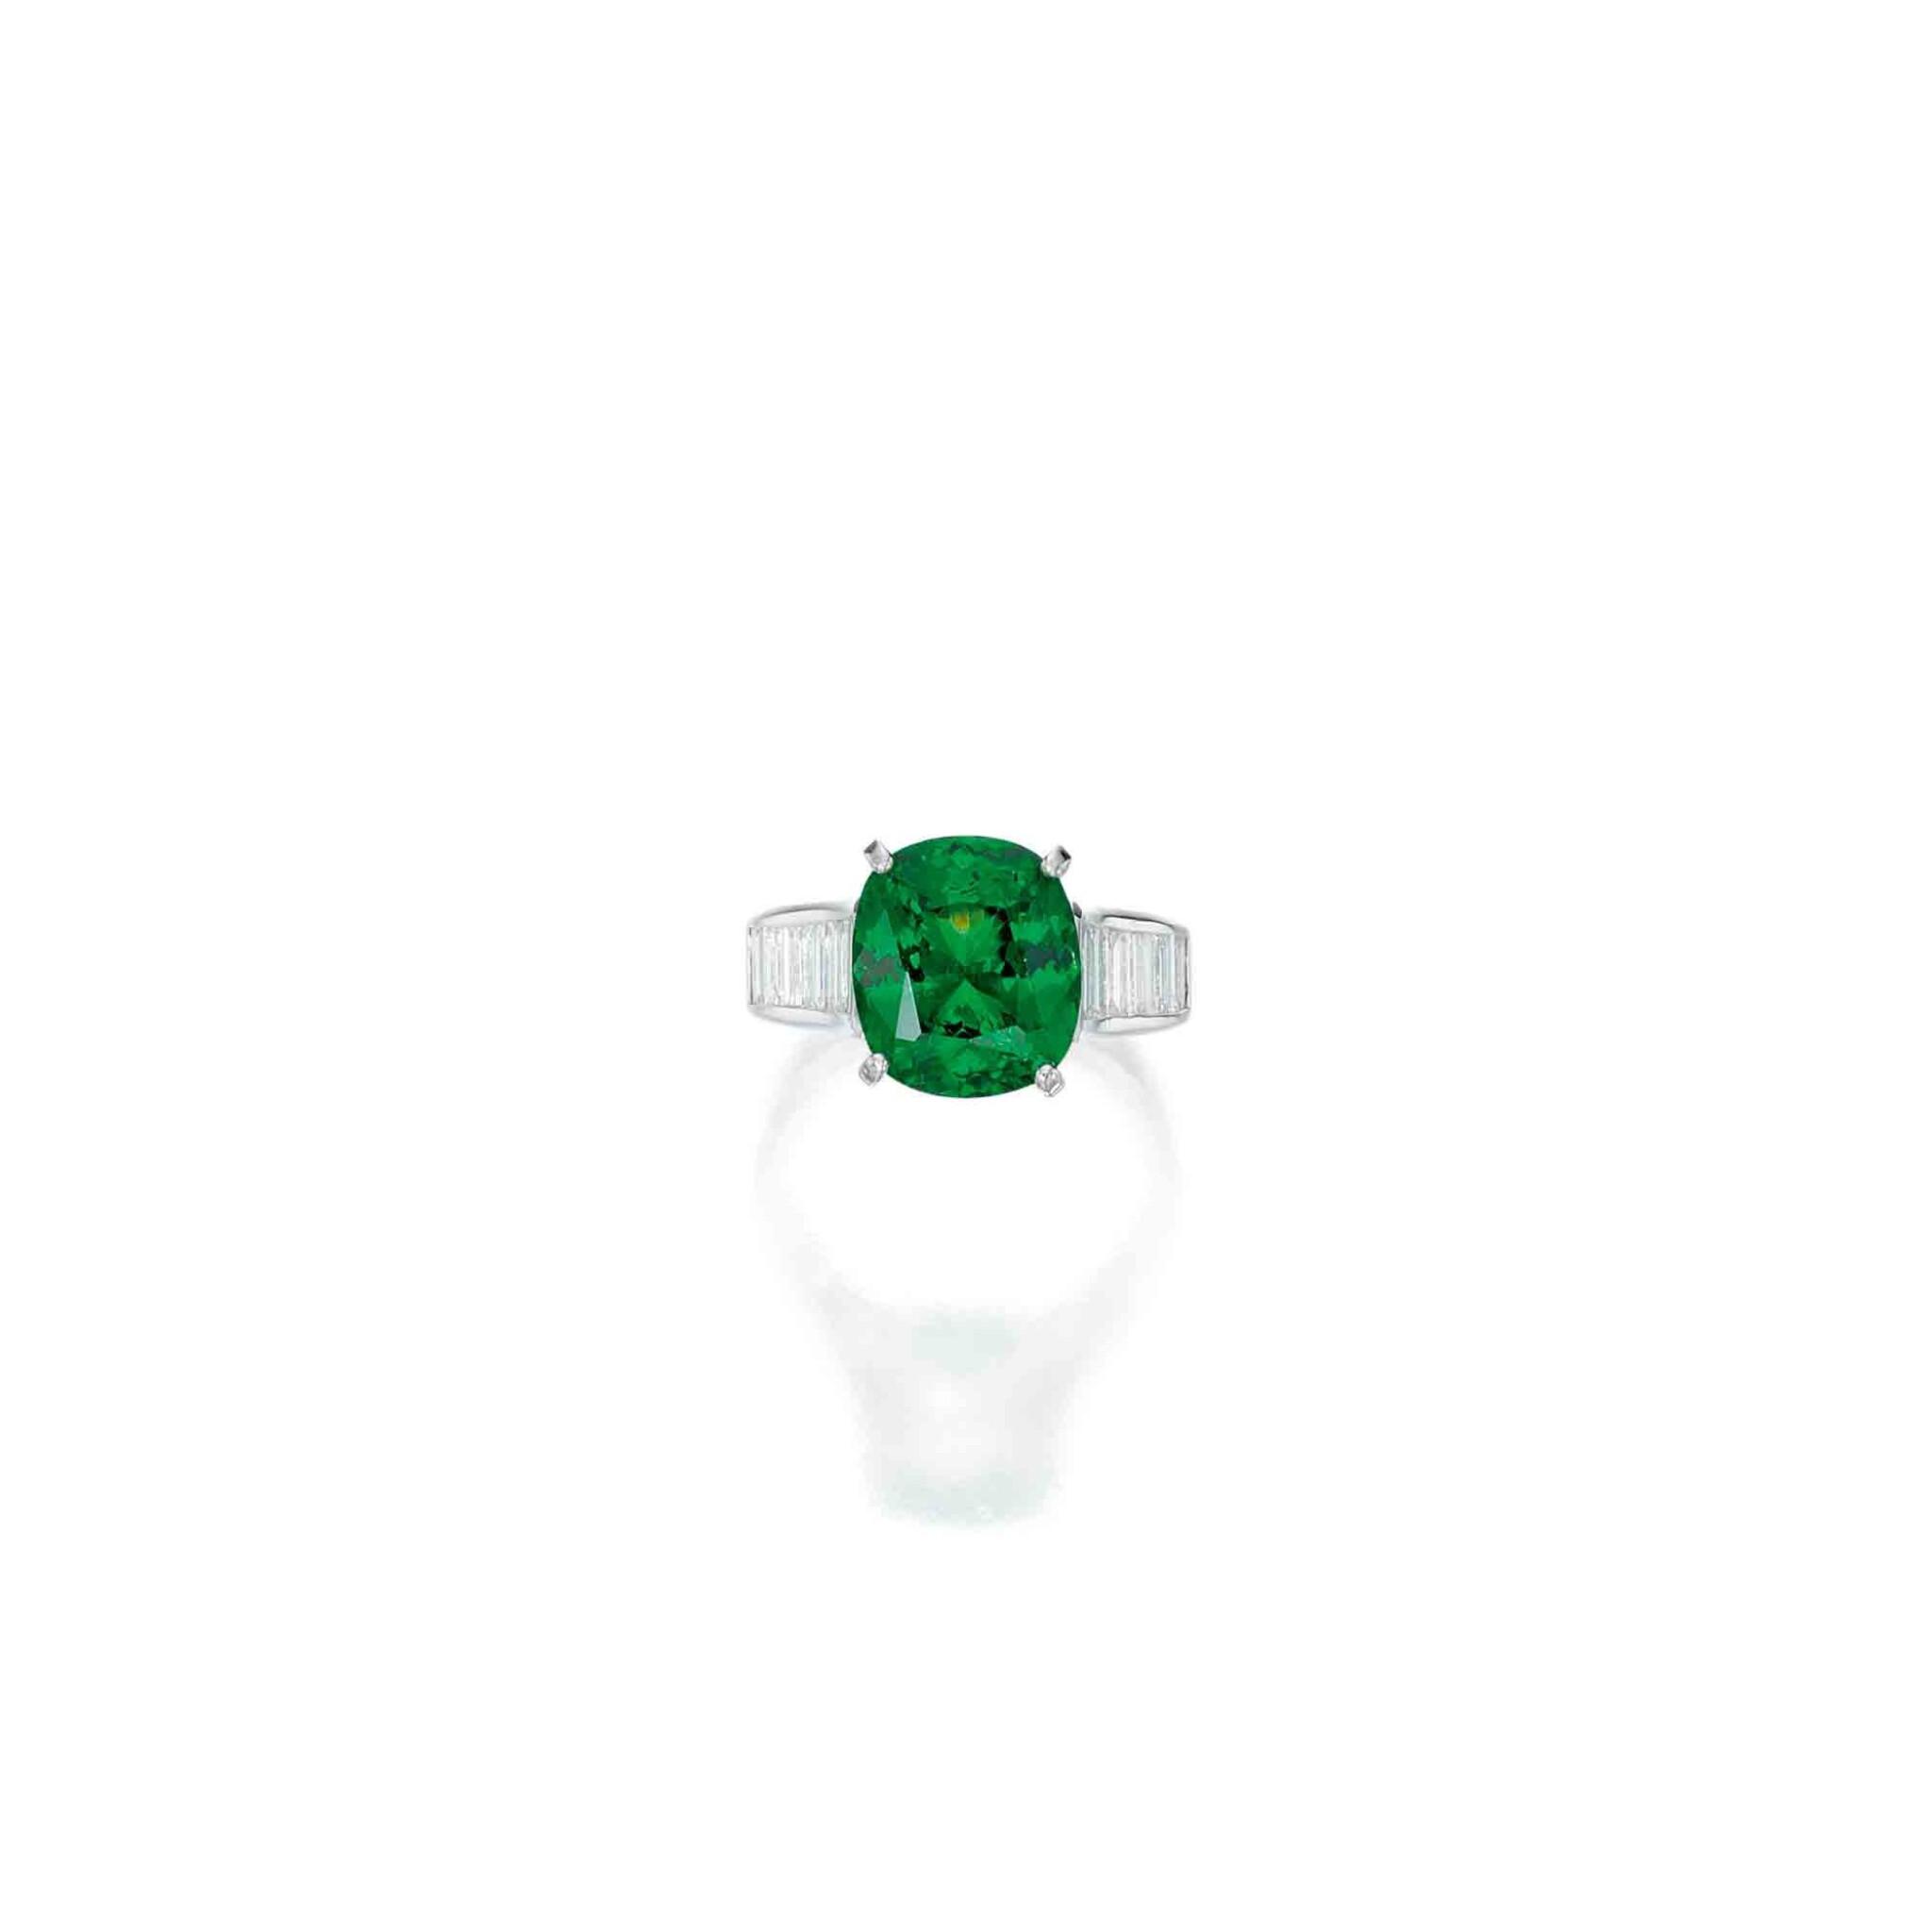 View full screen - View 1 of Lot 165. Van Cleef & Arpels [梵克雅寶] | Tsavorite Garnet and Diamond Ring [沙弗來石配鑽石戒指].